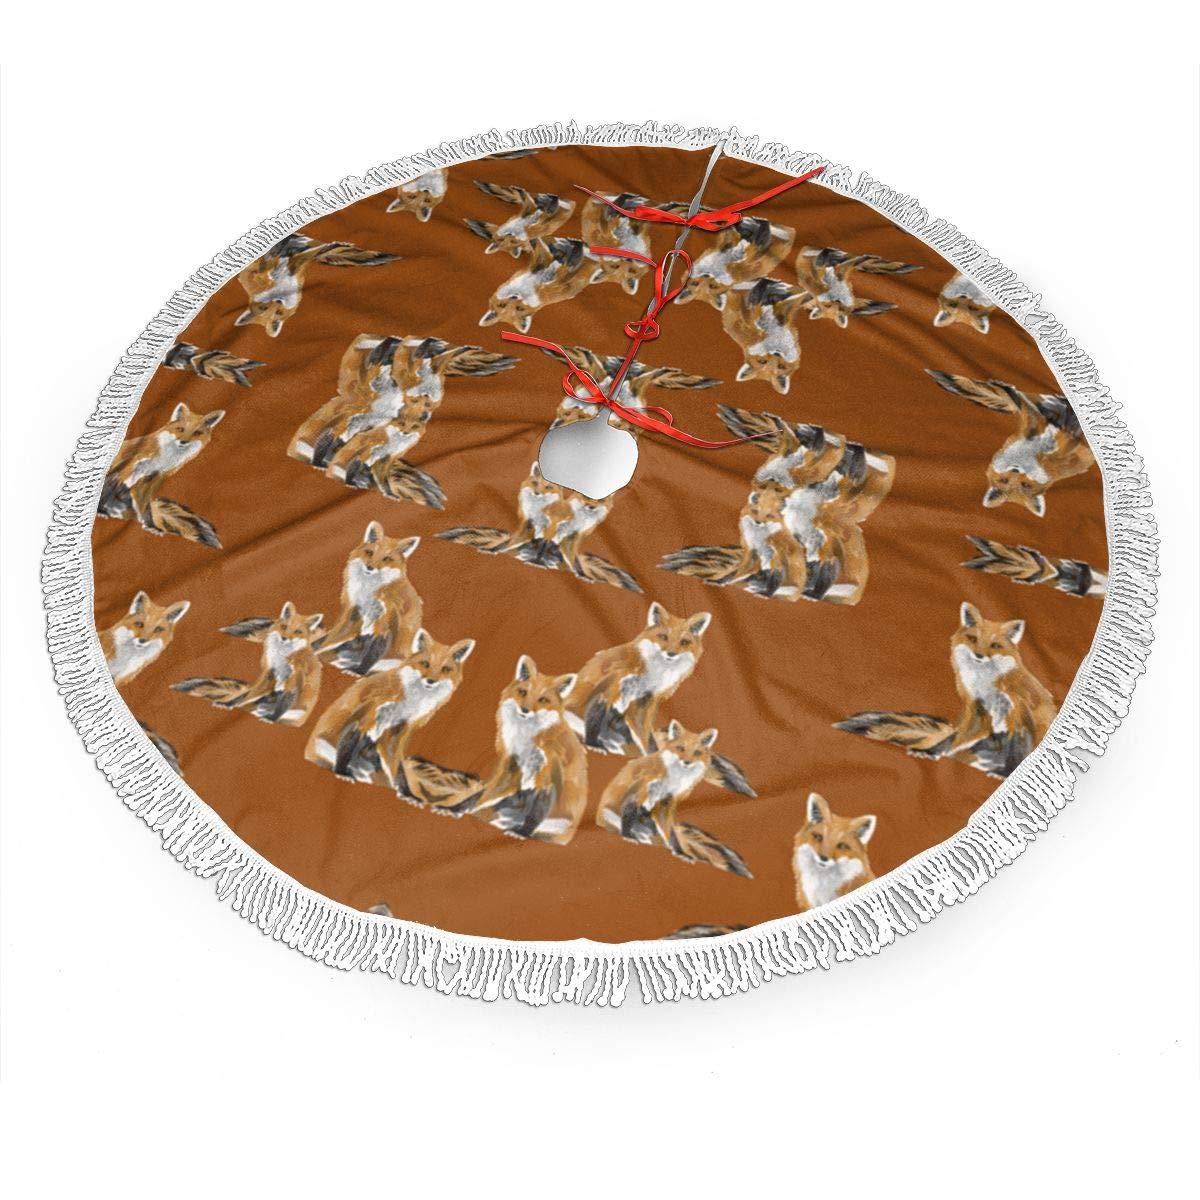 6842 Christmas Tree Skirt 30 36 48 Brushed Fabric with White Fringed Lace Dlskjda Friendly Foxes On Burnt Orange 7527